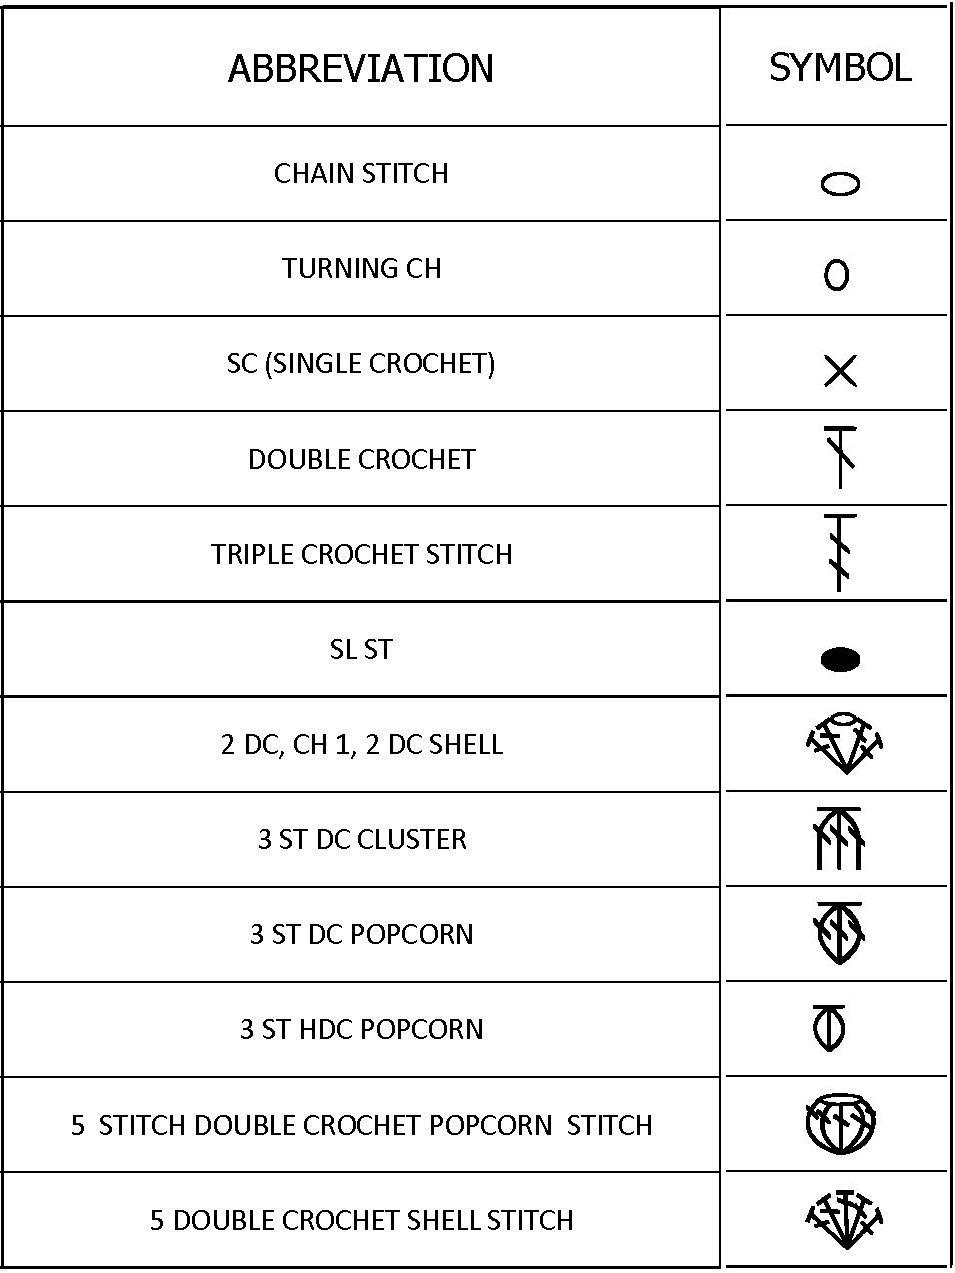 Crochet symbols part 1 | crochet: how tos and sites/ free ...